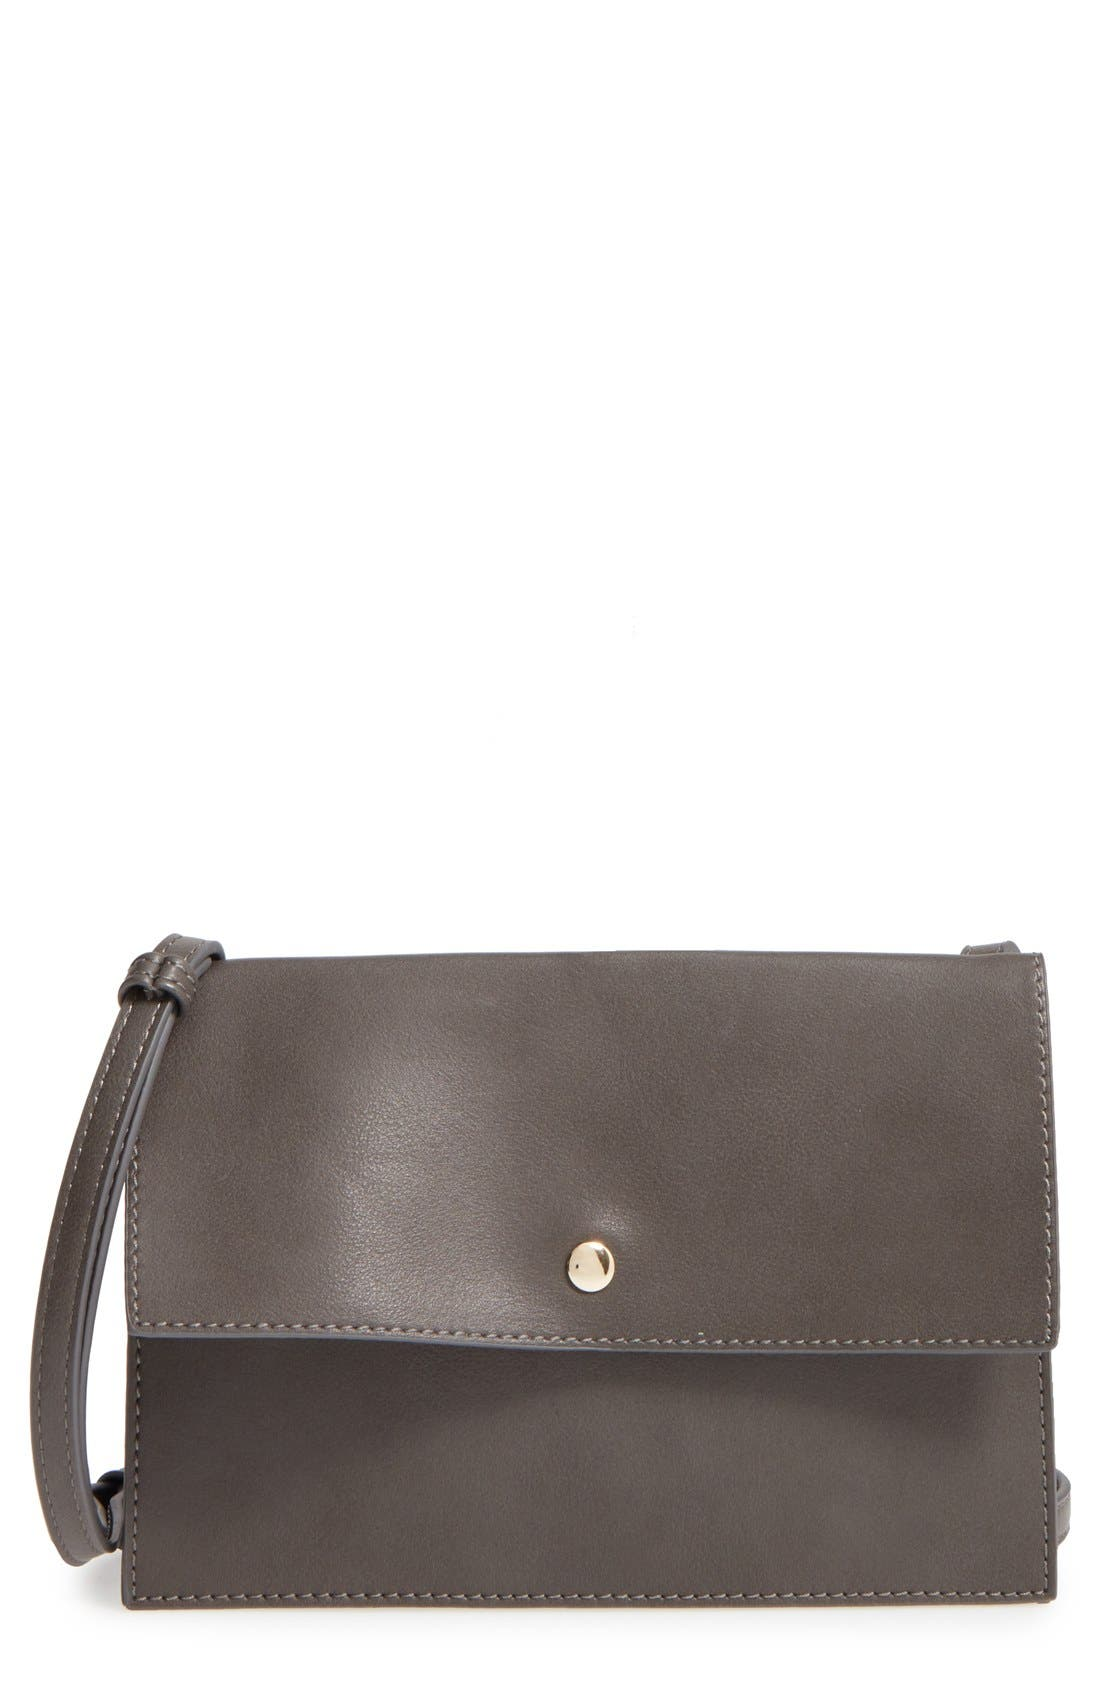 SOLE SOCIETY, 'Vanessa' Faux Leather Crossbody Bag, Main thumbnail 1, color, 020